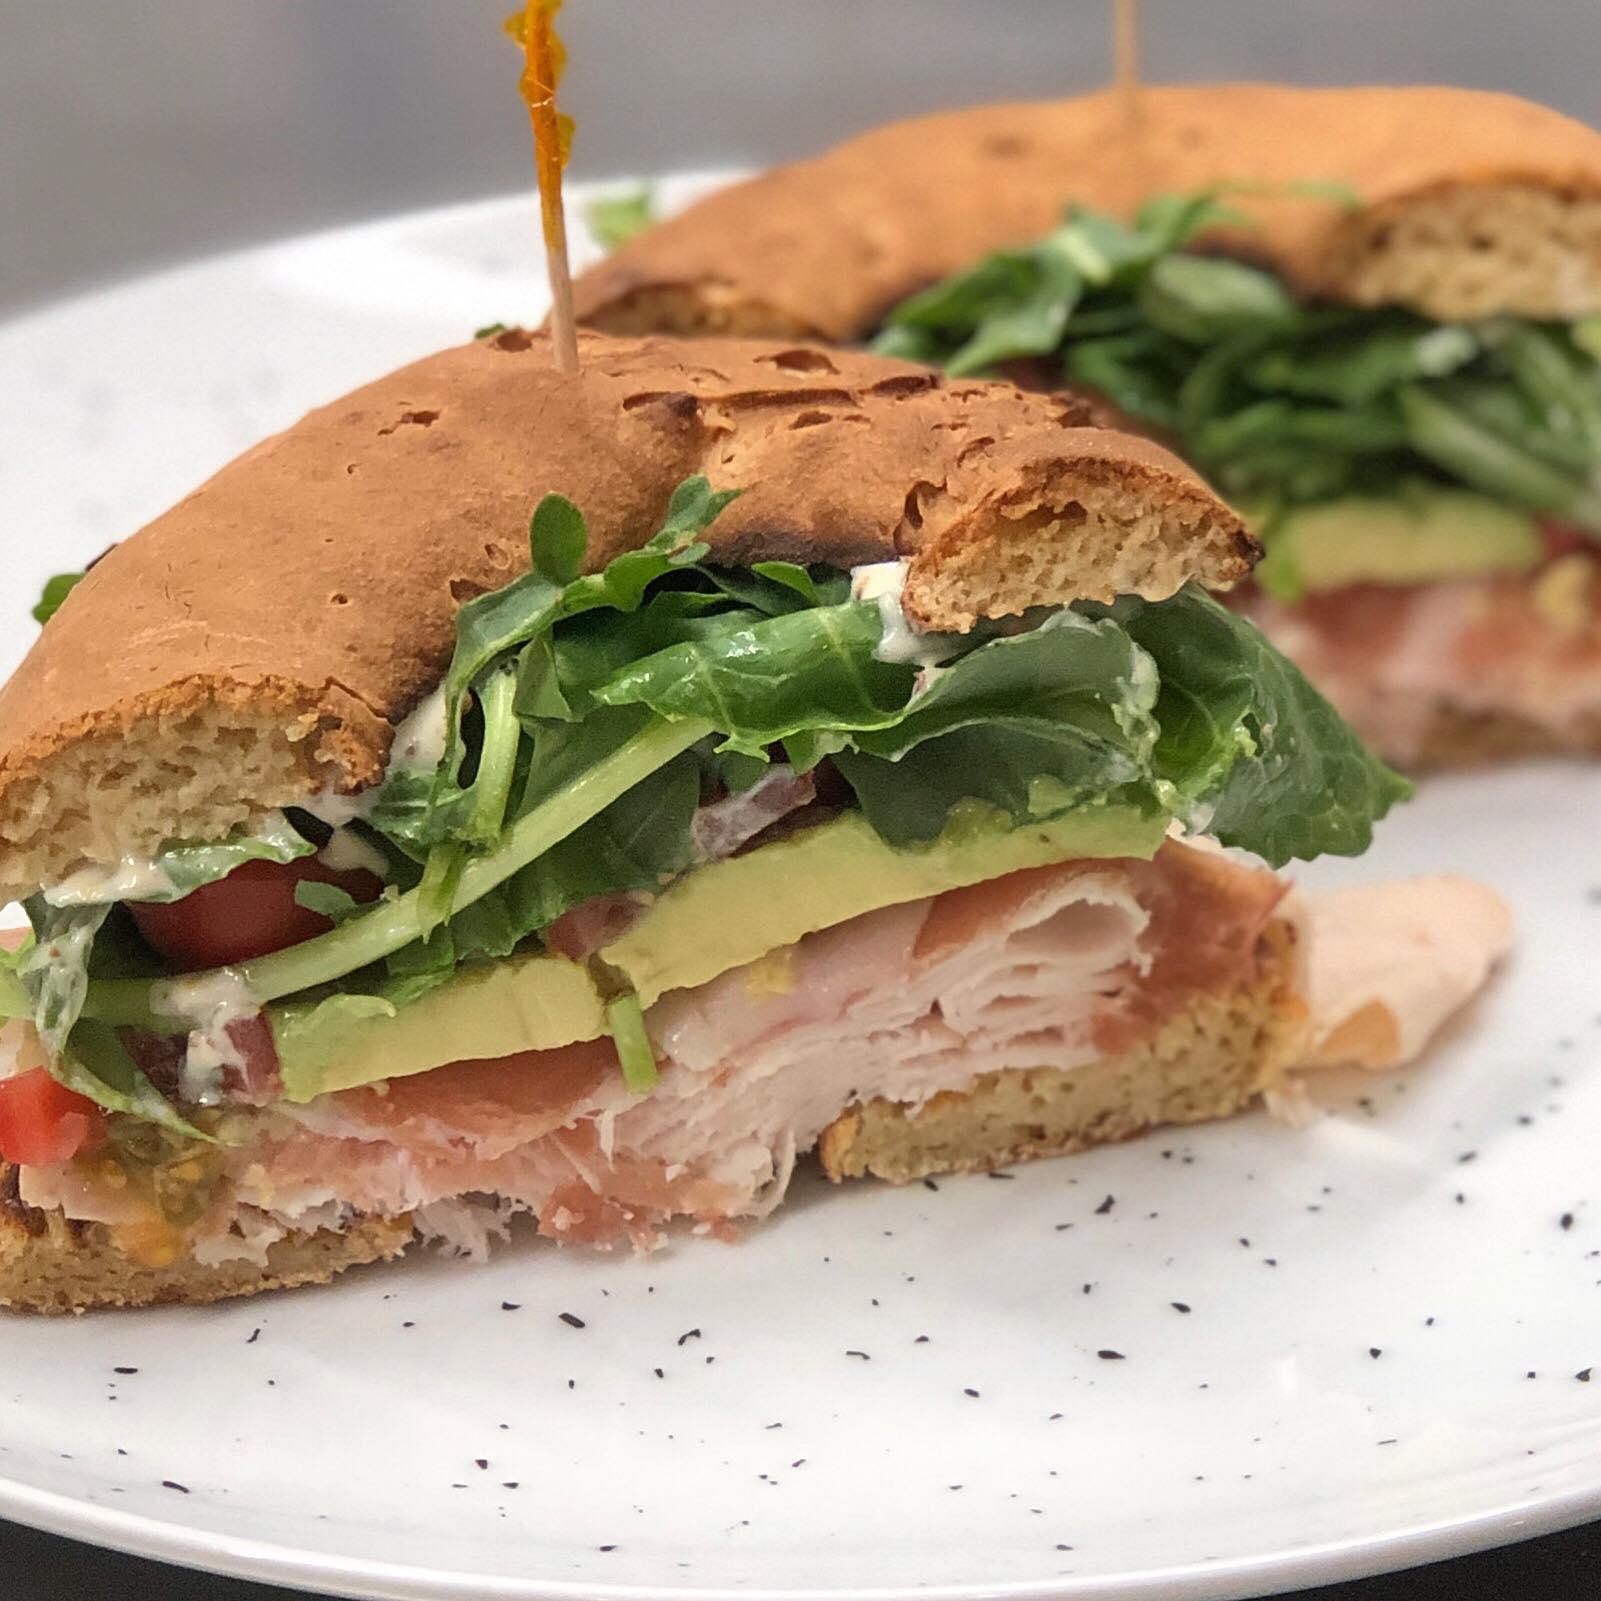 Turkey Prosciutto Bagel Sandwich